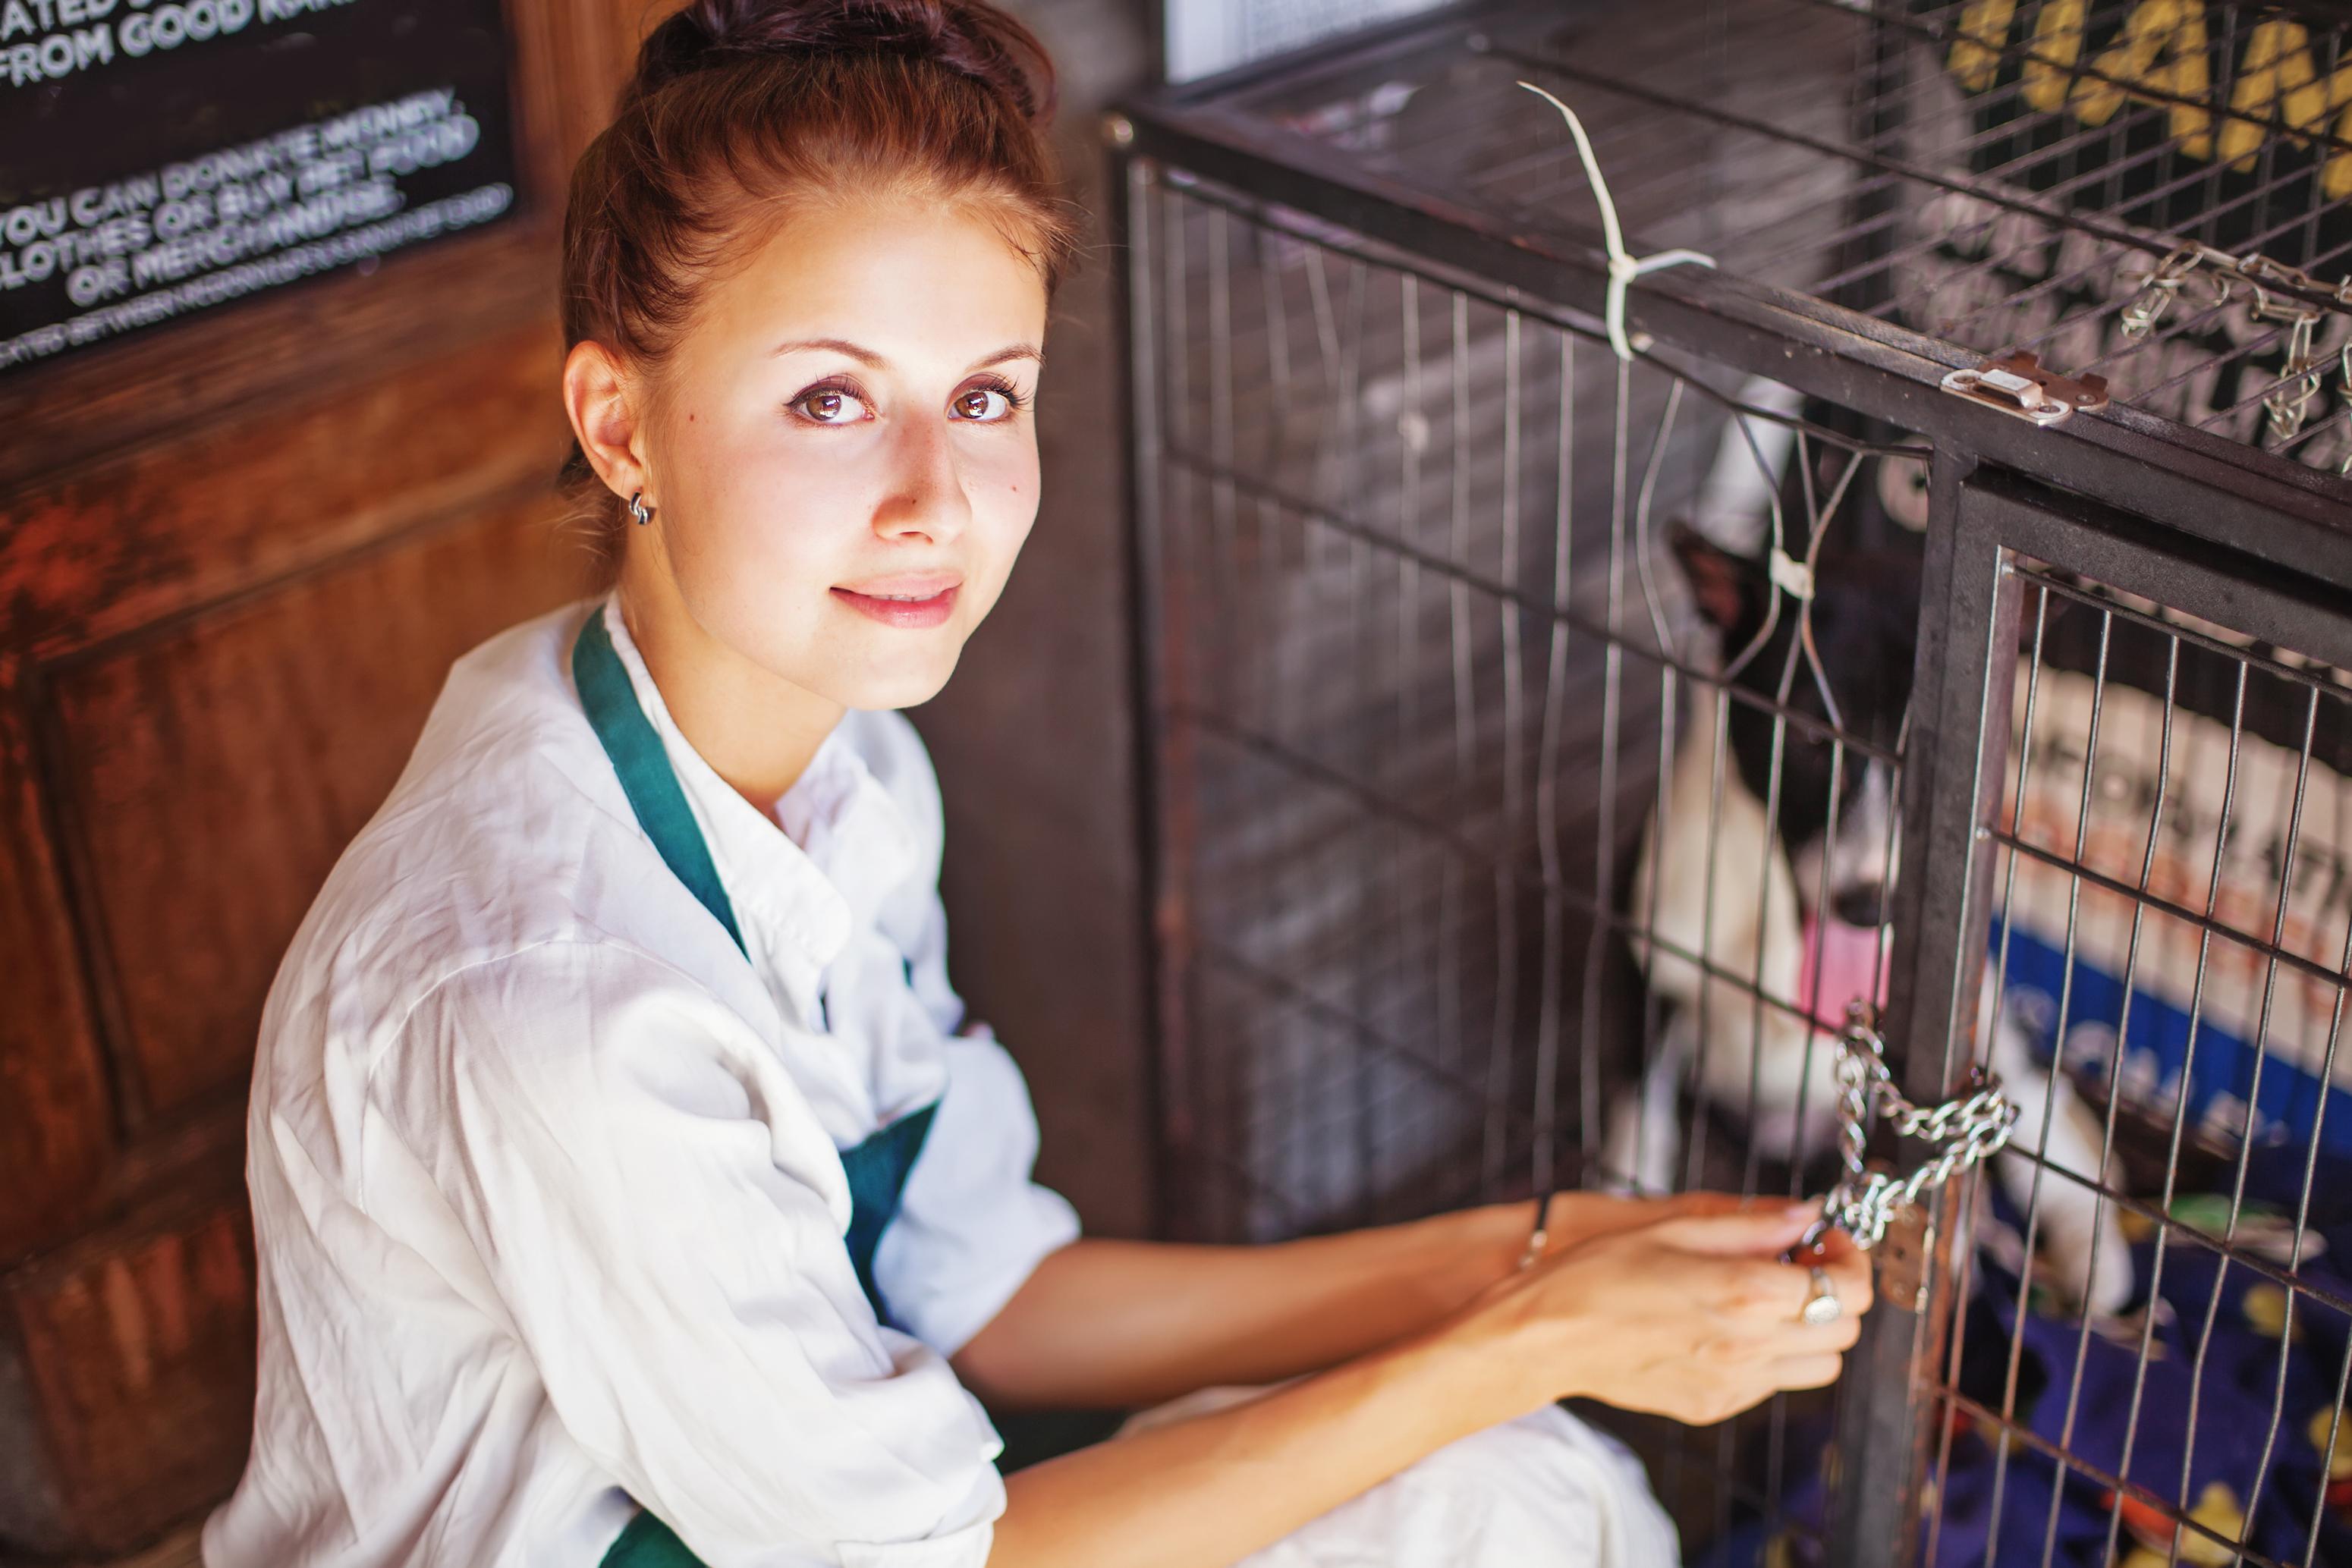 Animal Foster Care